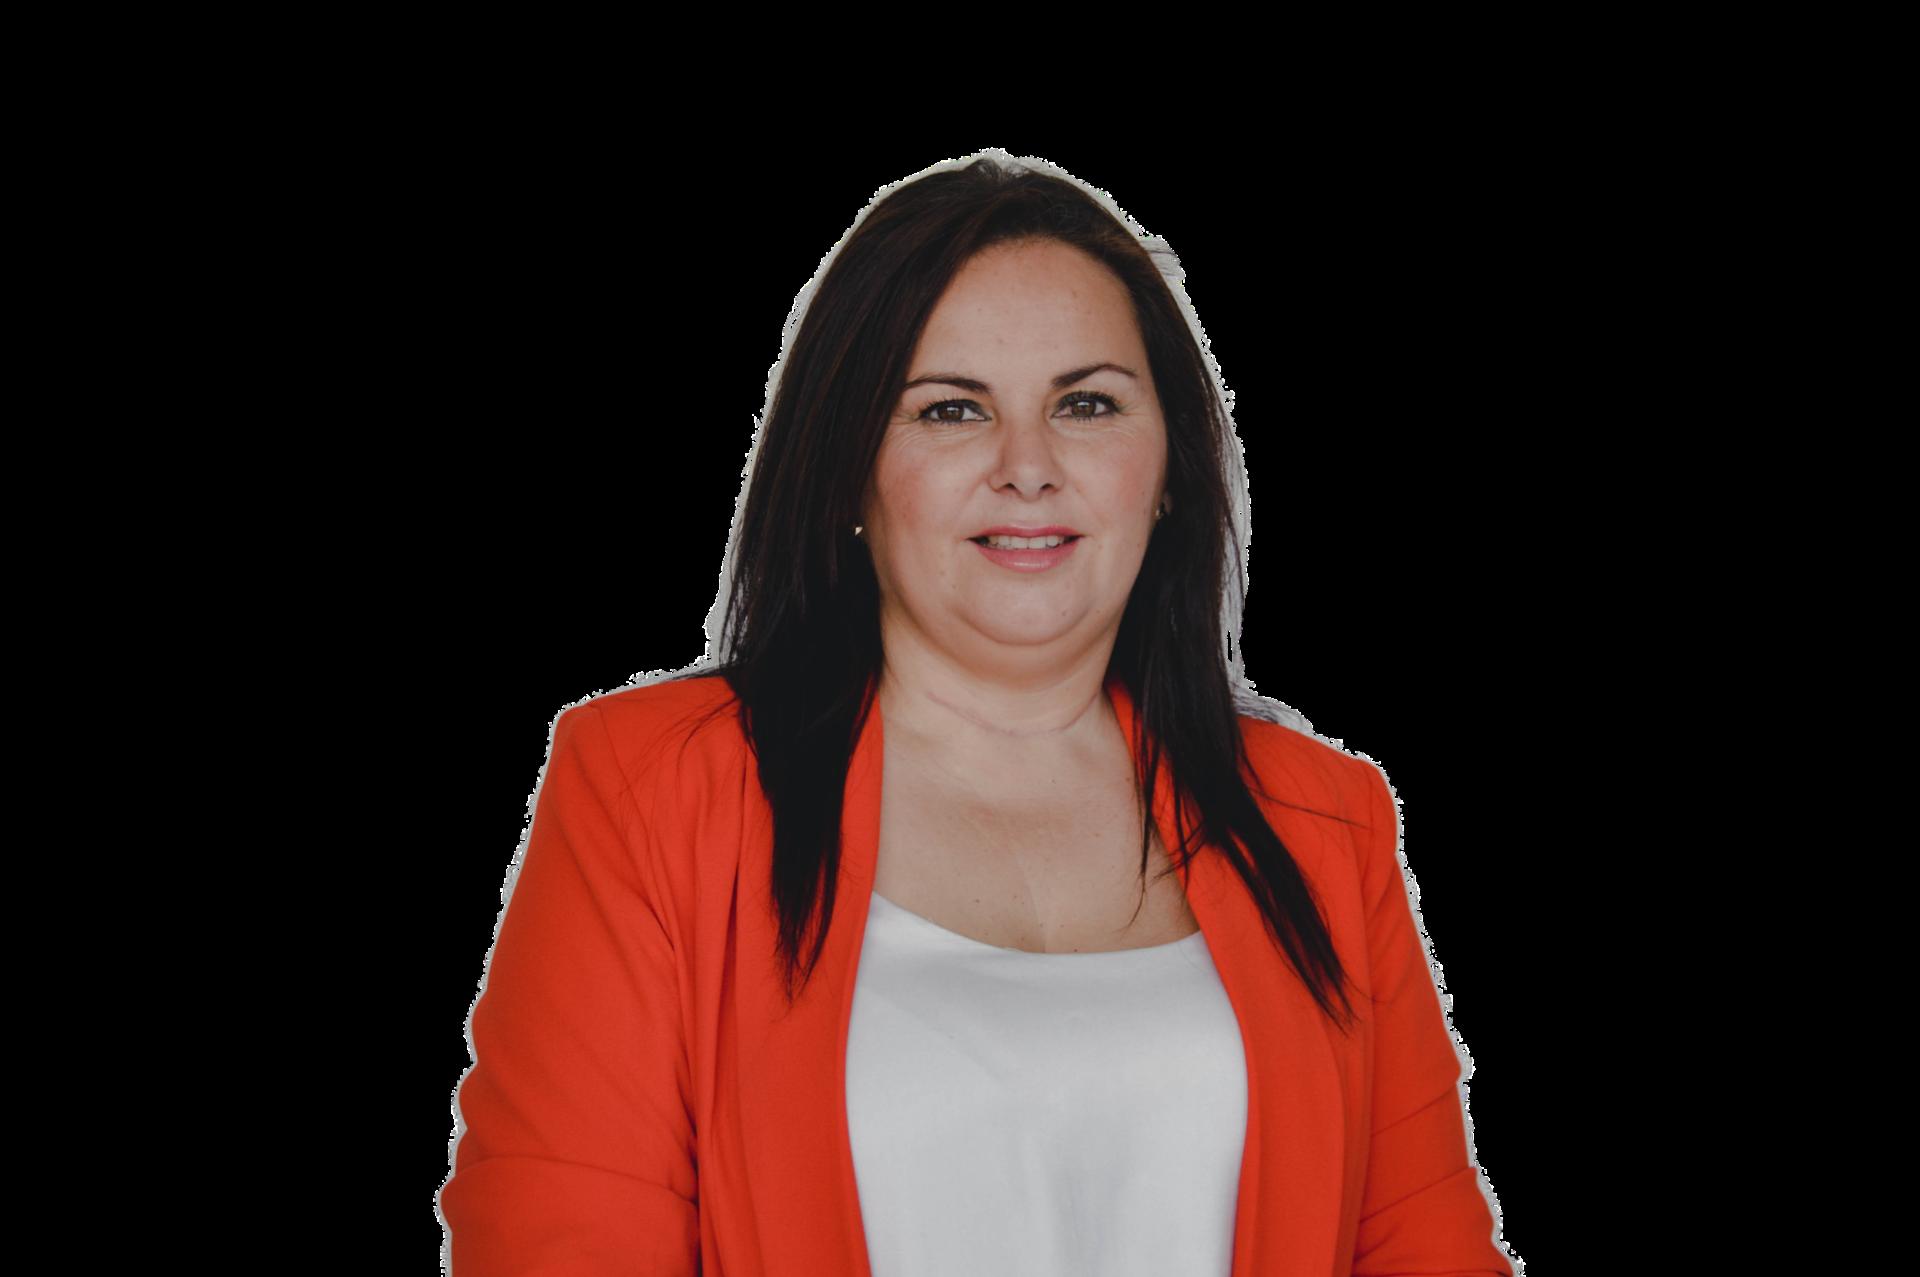 Raquel Castaño Peña